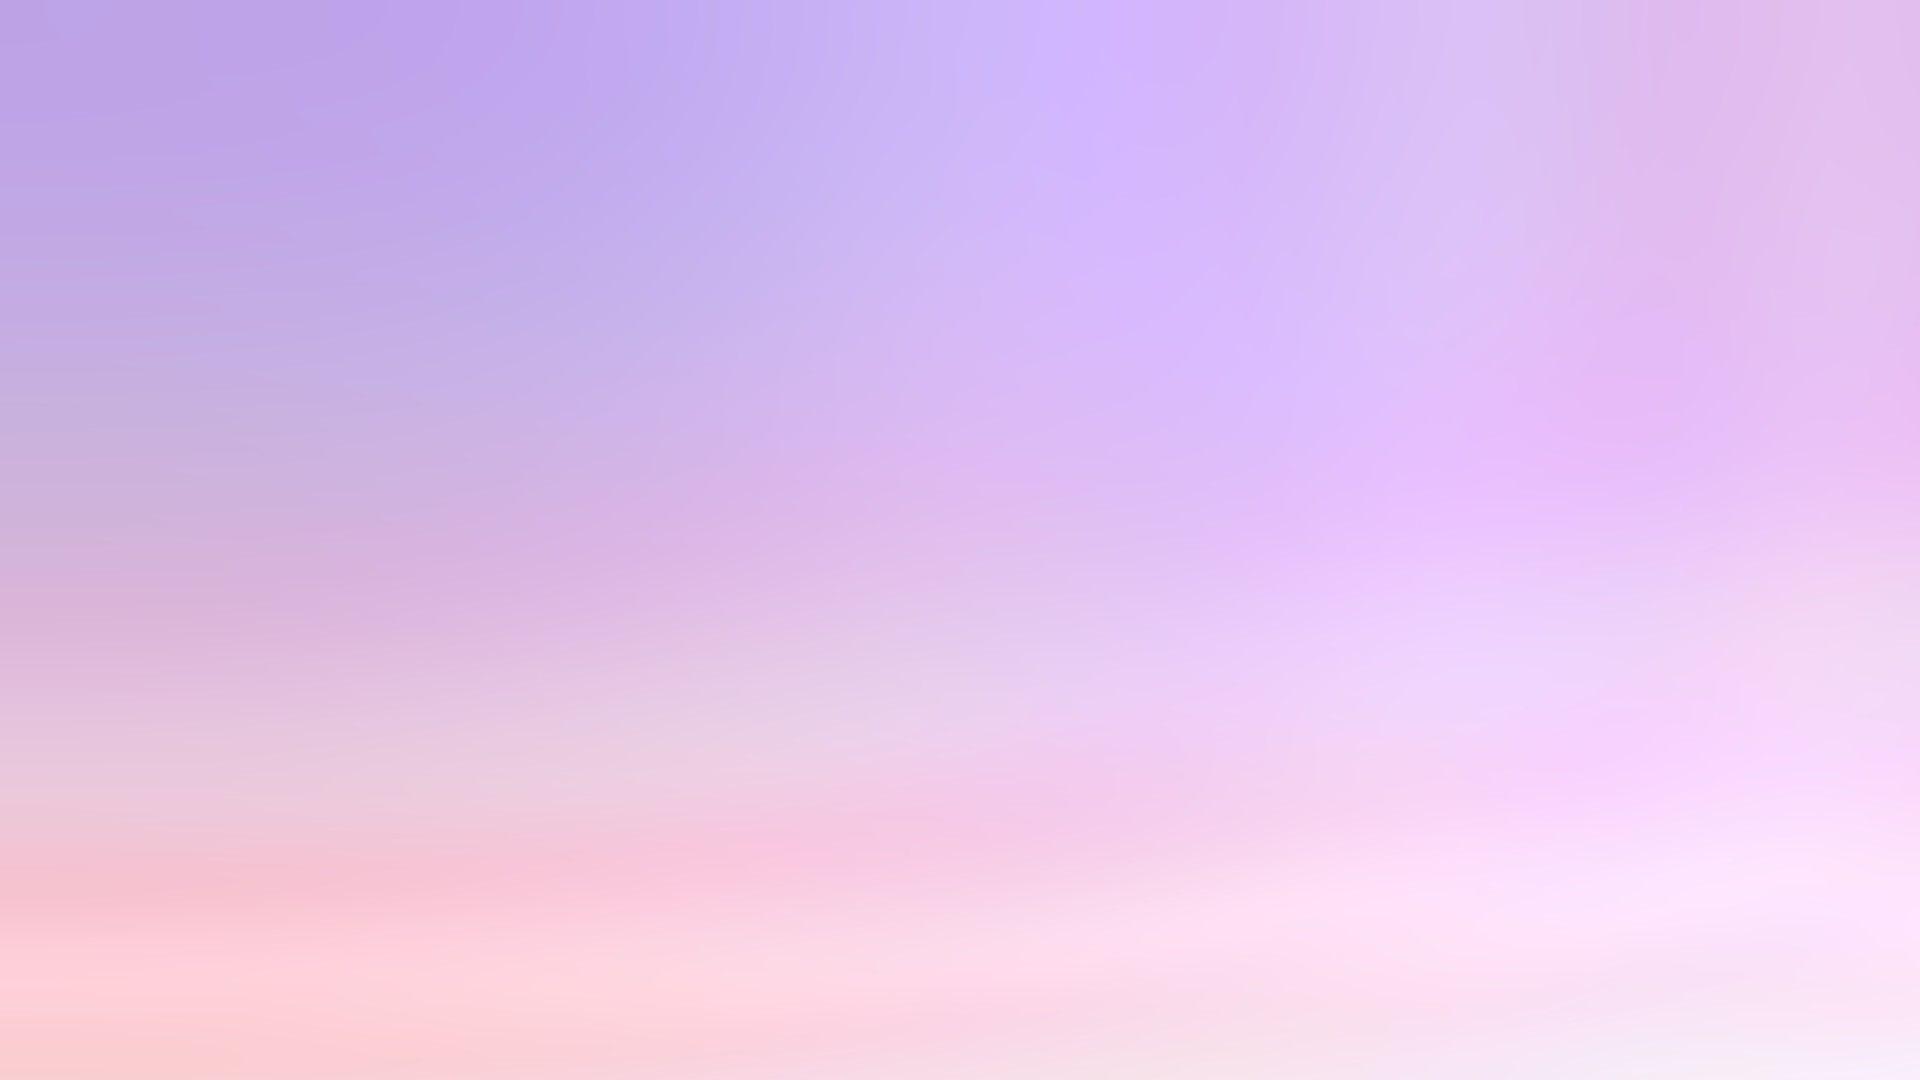 … dark sky wallpaper background bhstorm com …